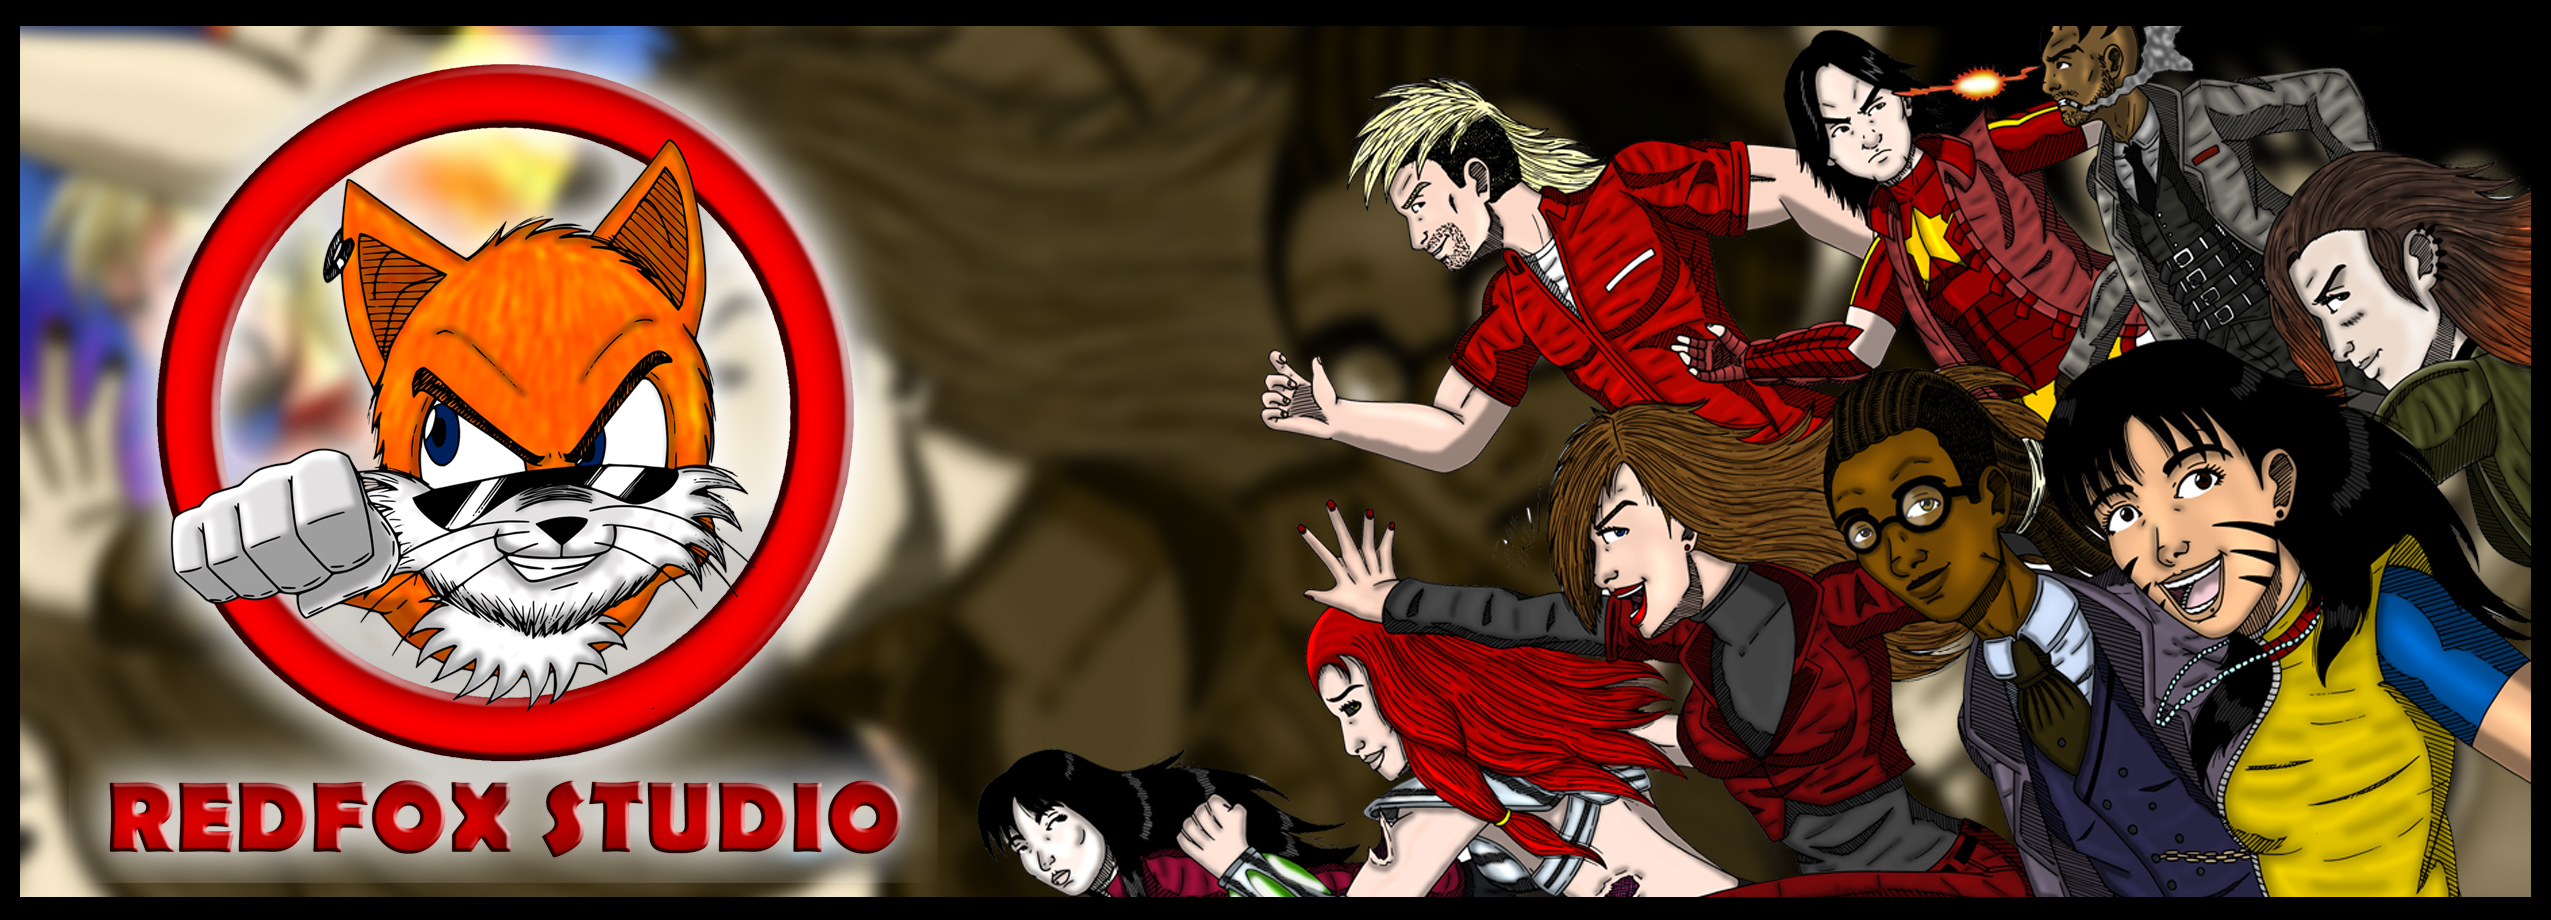 Redfox comics logo padrim c%c3%b3pia